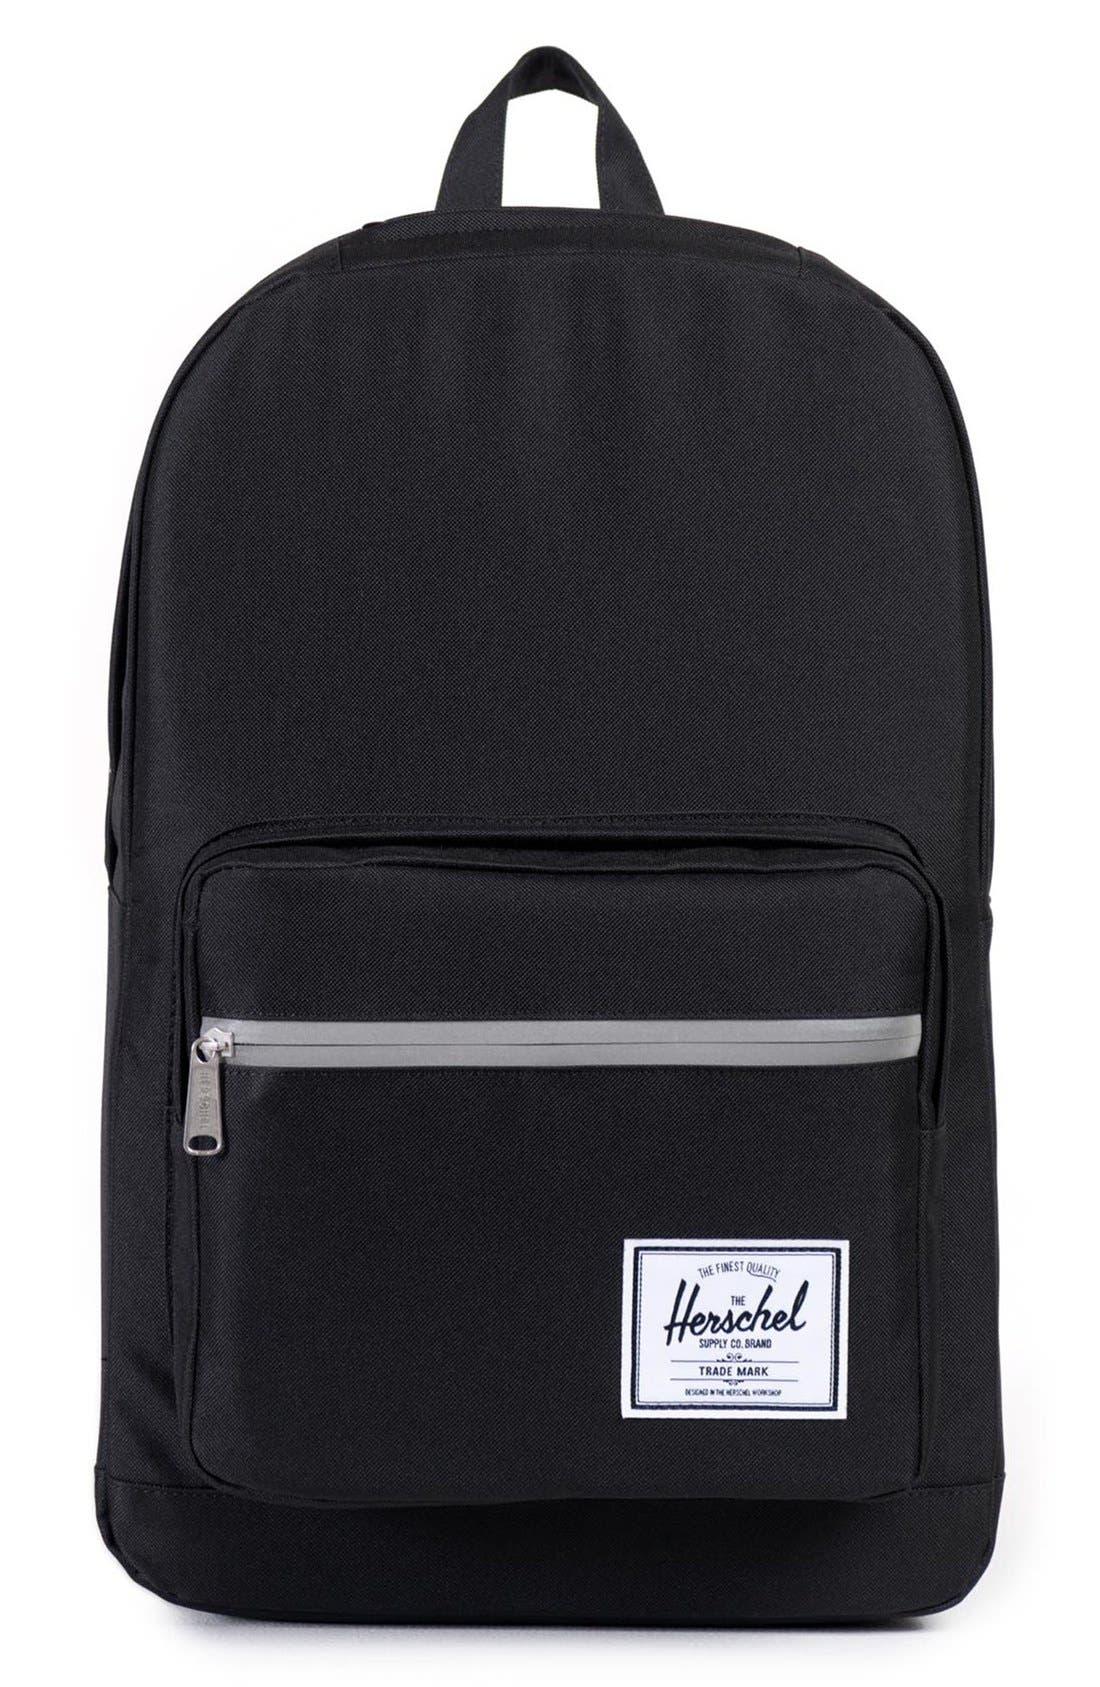 'Pop Quiz' Backpack,                             Main thumbnail 1, color,                             Black/ 3M